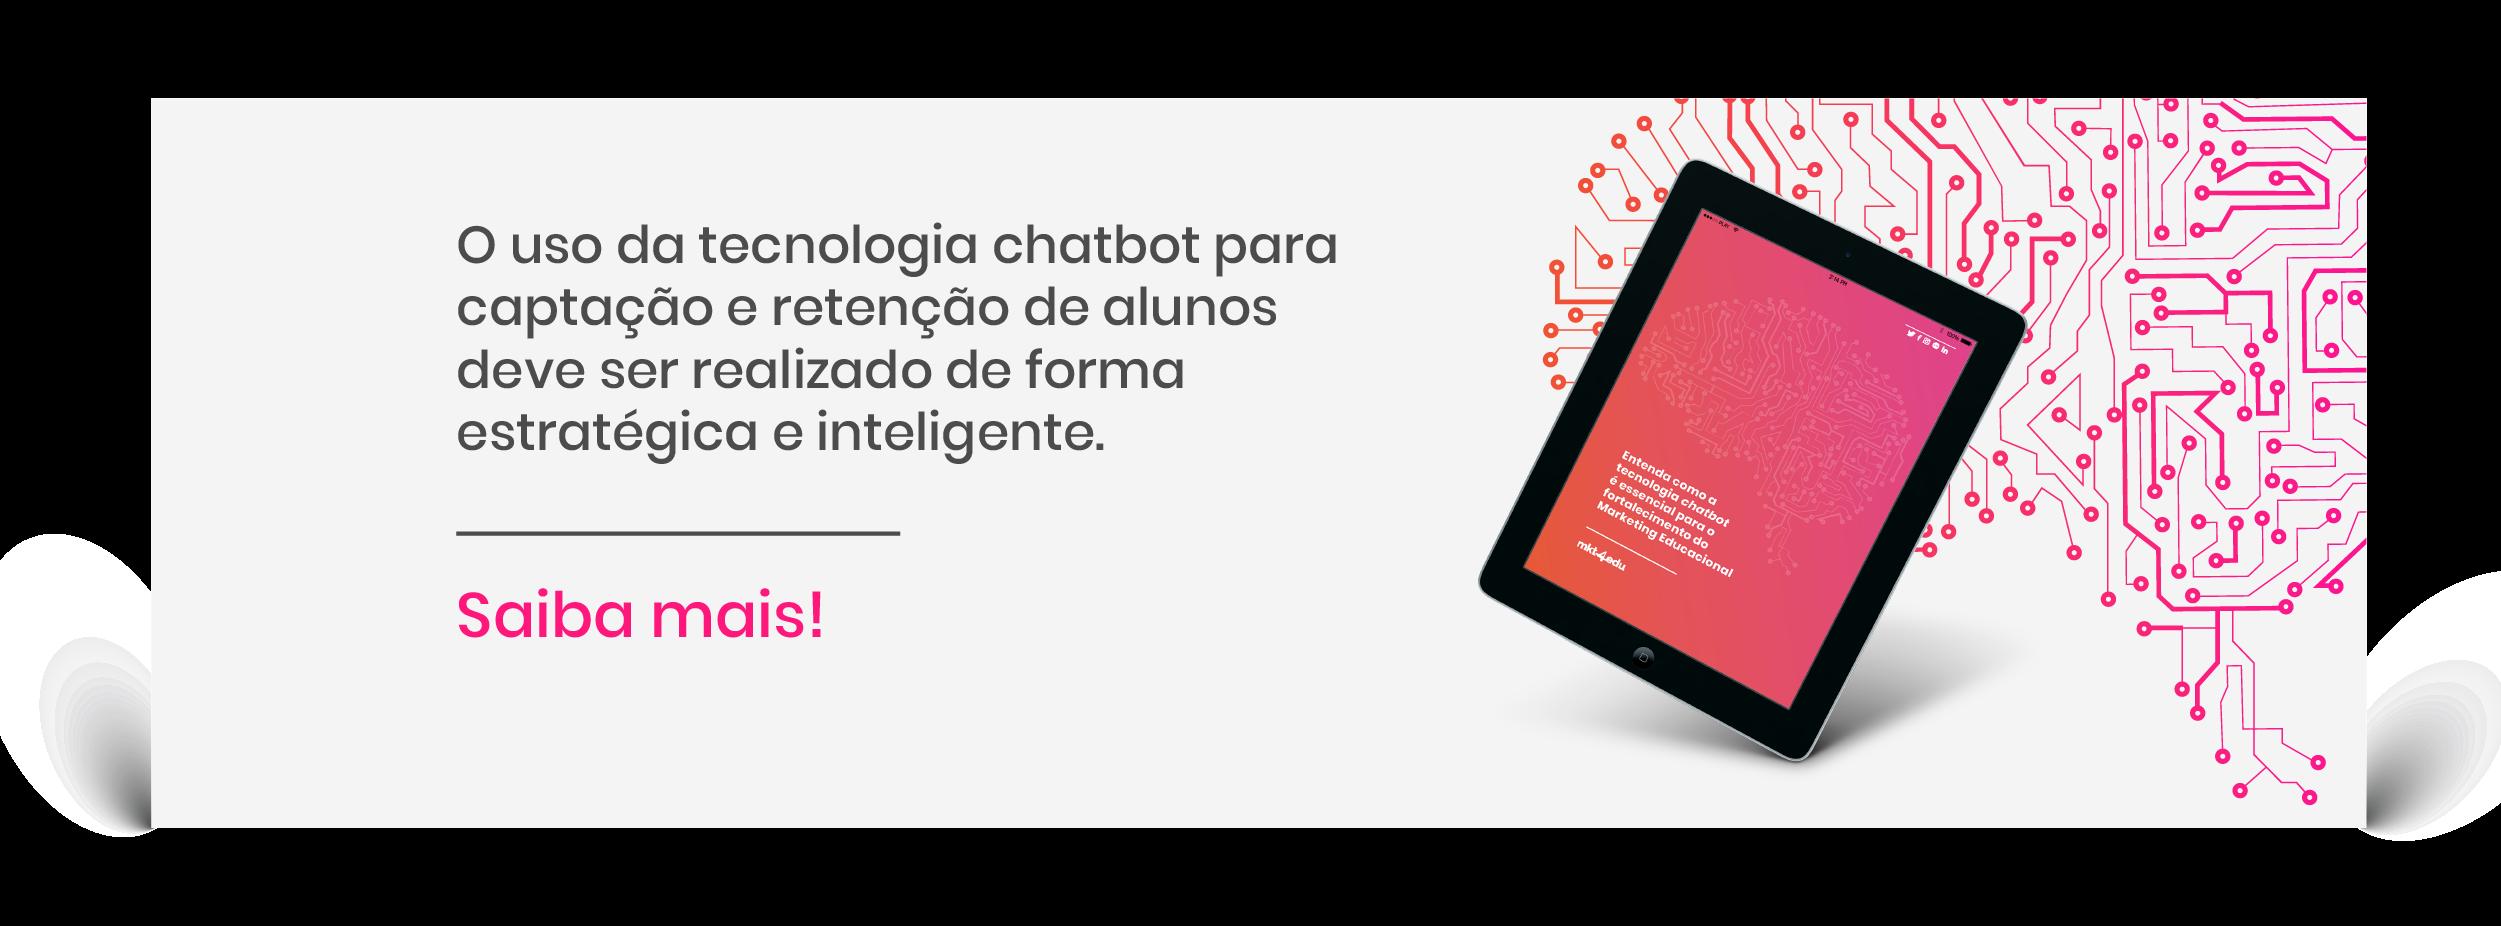 Entenda como a tecnologia chatbot é essencial para o fortalecimento do marketing educacional